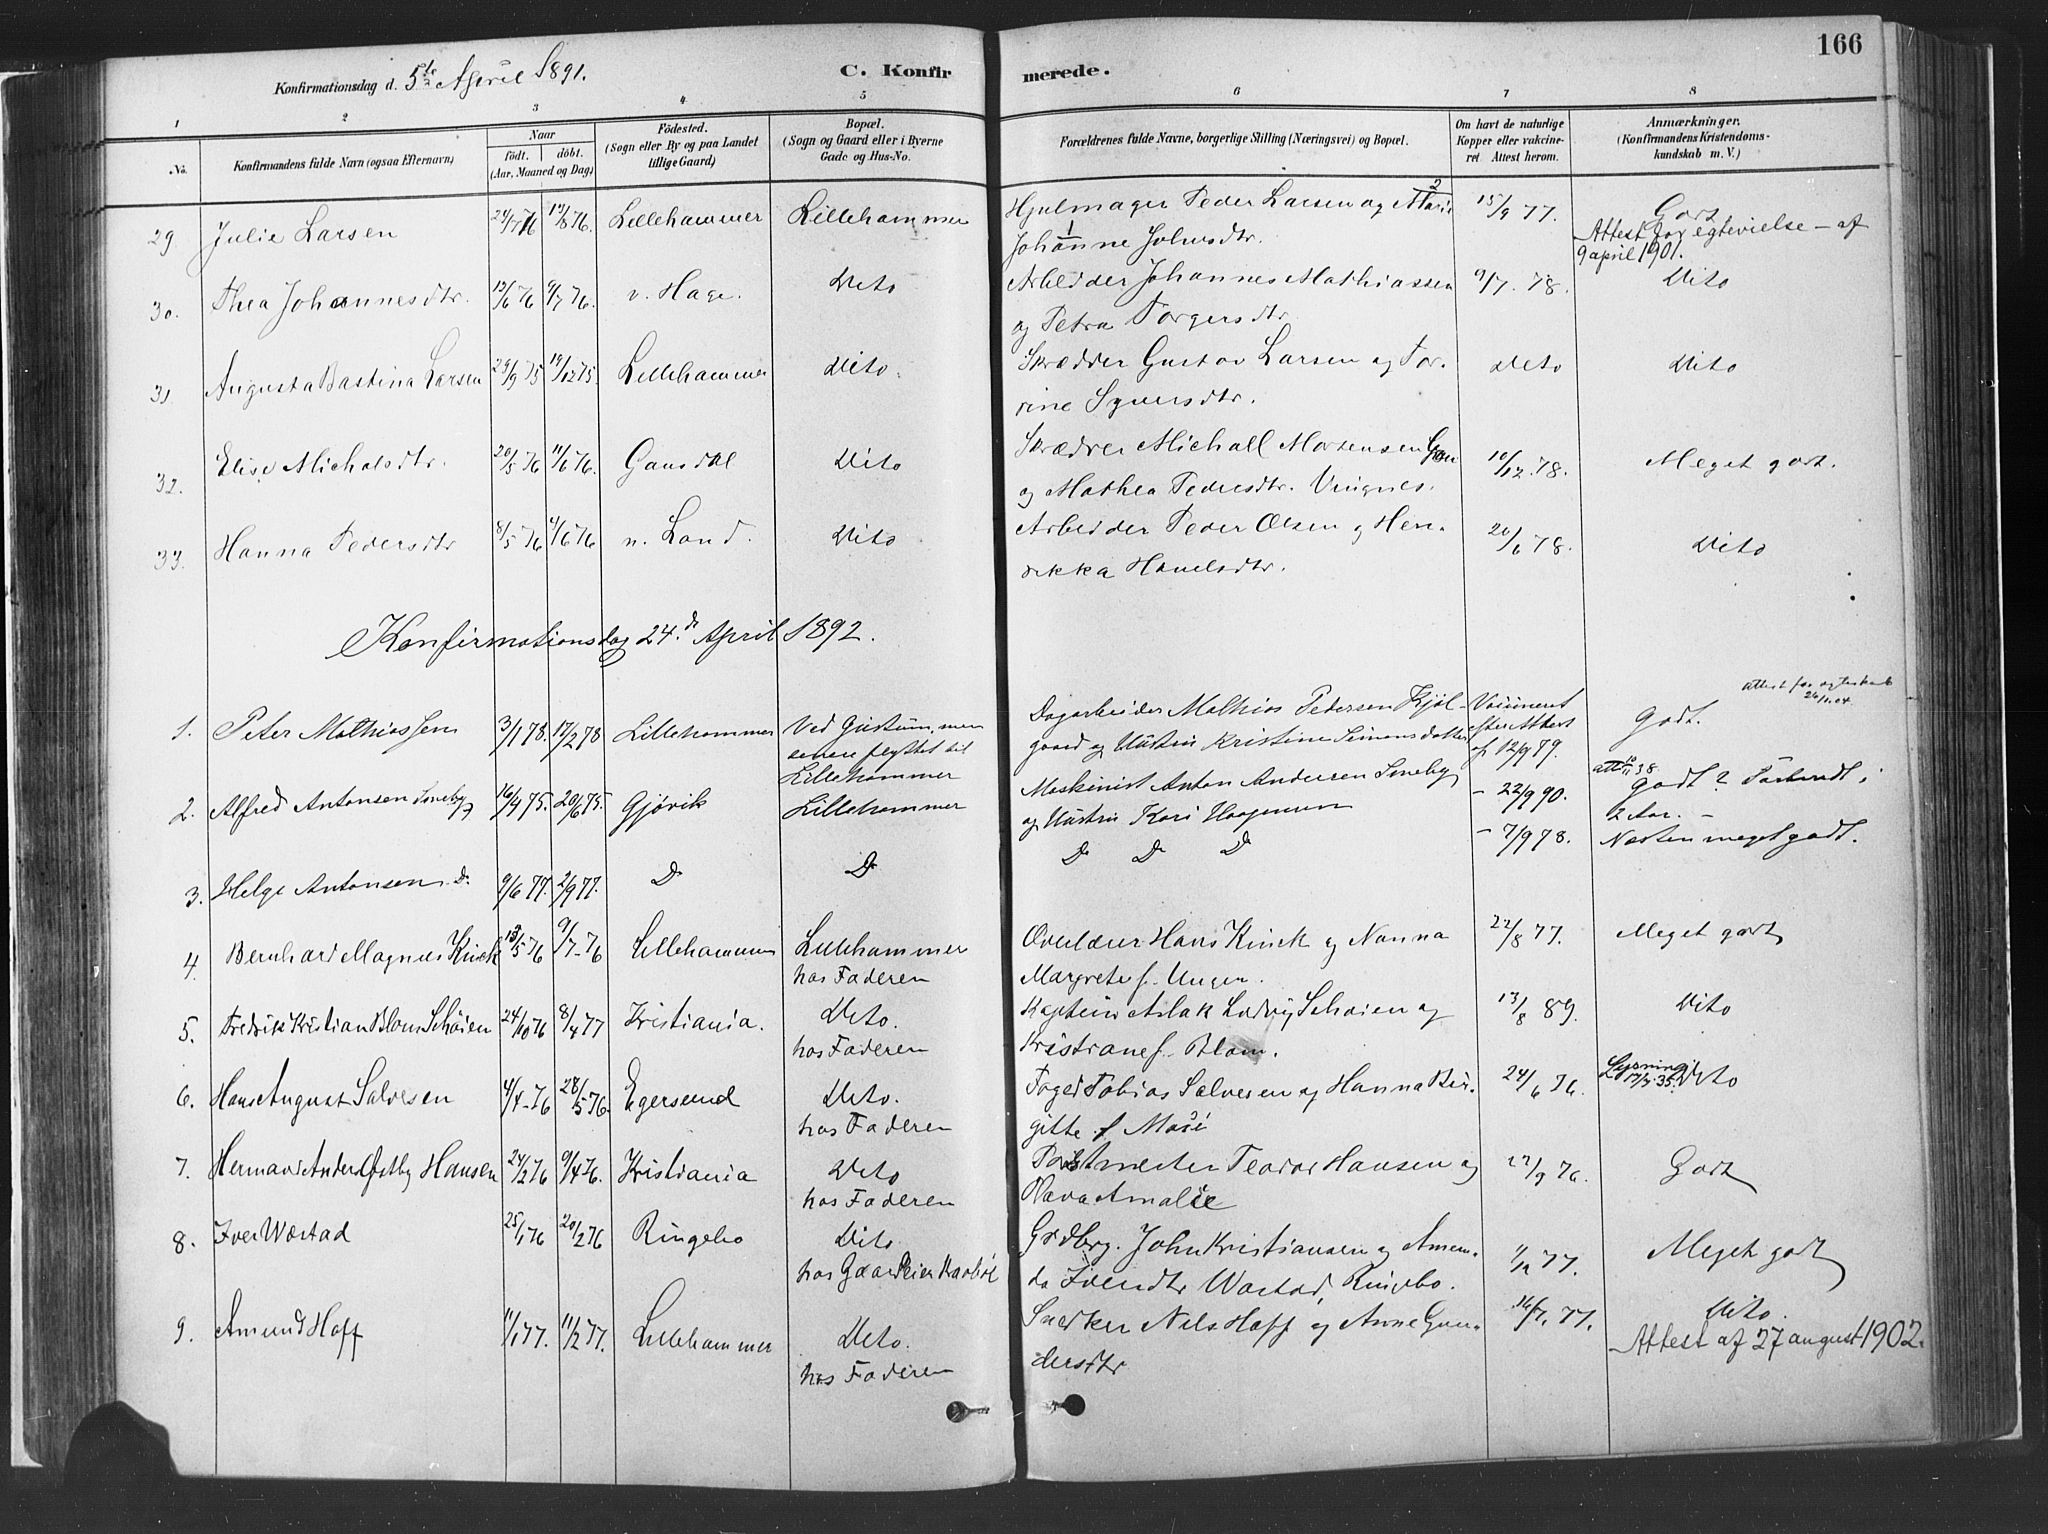 SAH, Fåberg prestekontor, Ministerialbok nr. 10, 1879-1900, s. 166